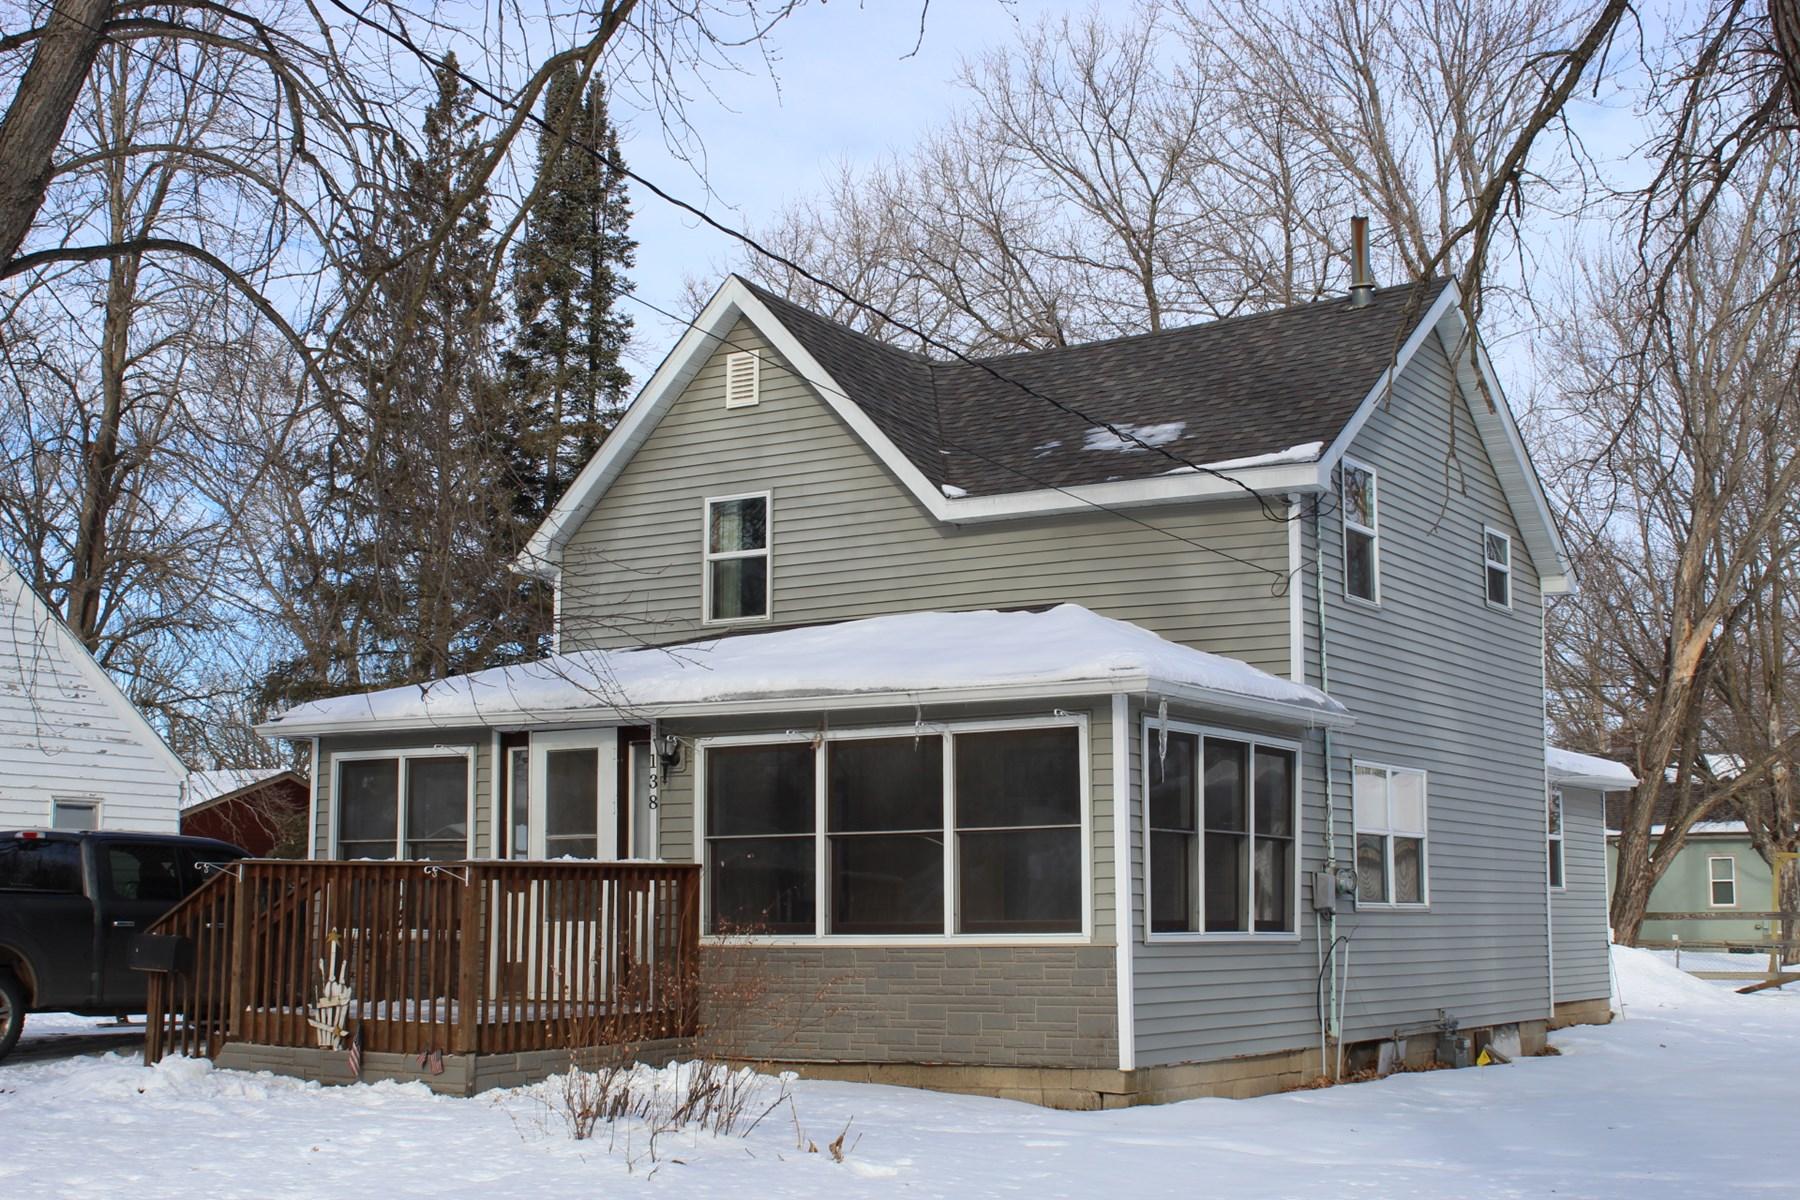 Milaca 3BR/2BA Home for Sale